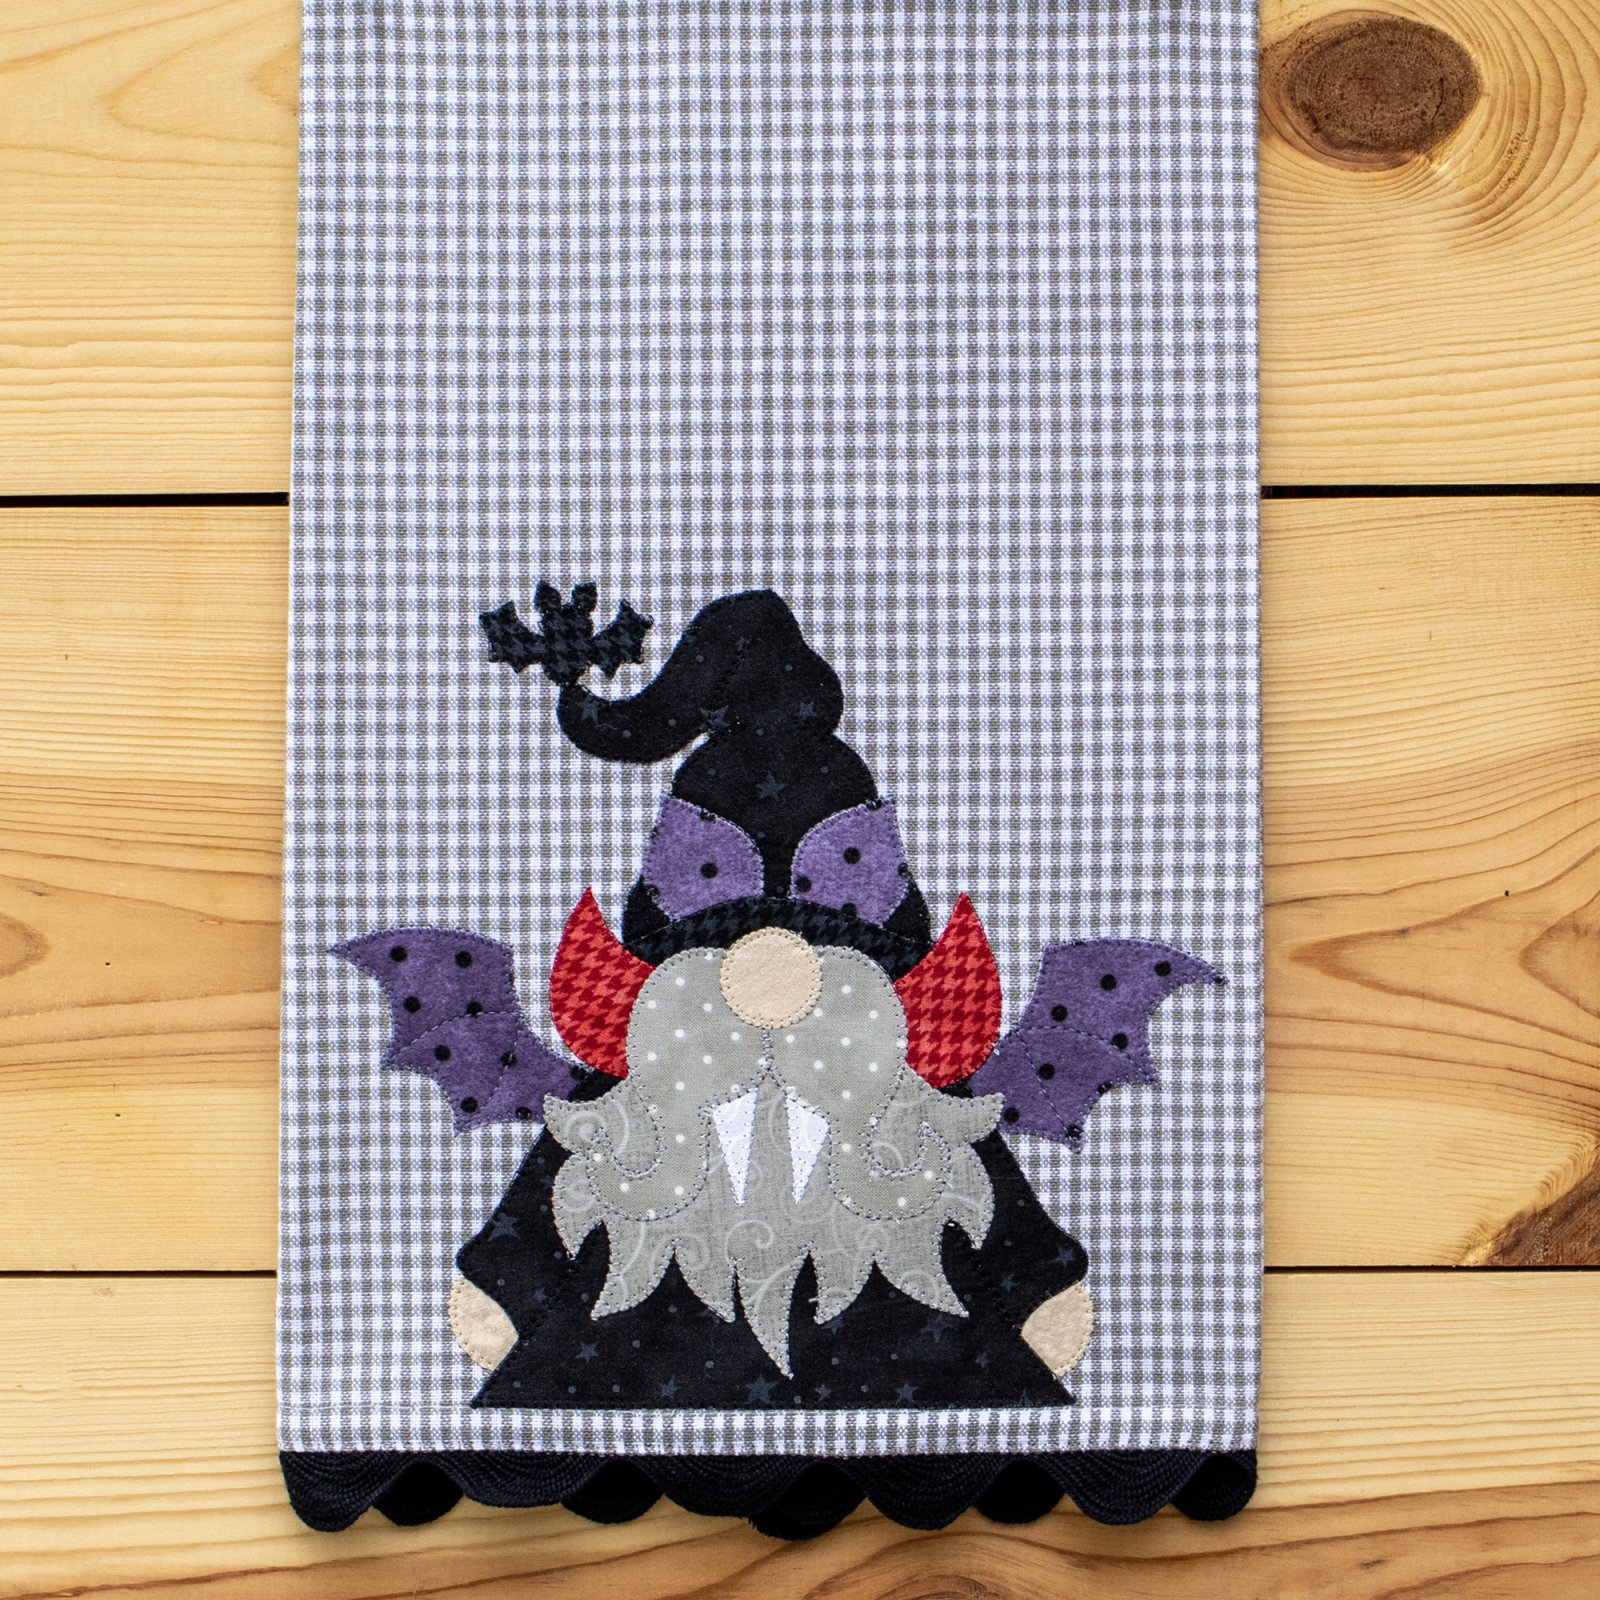 Dracula Gnome Tea Towel Kit